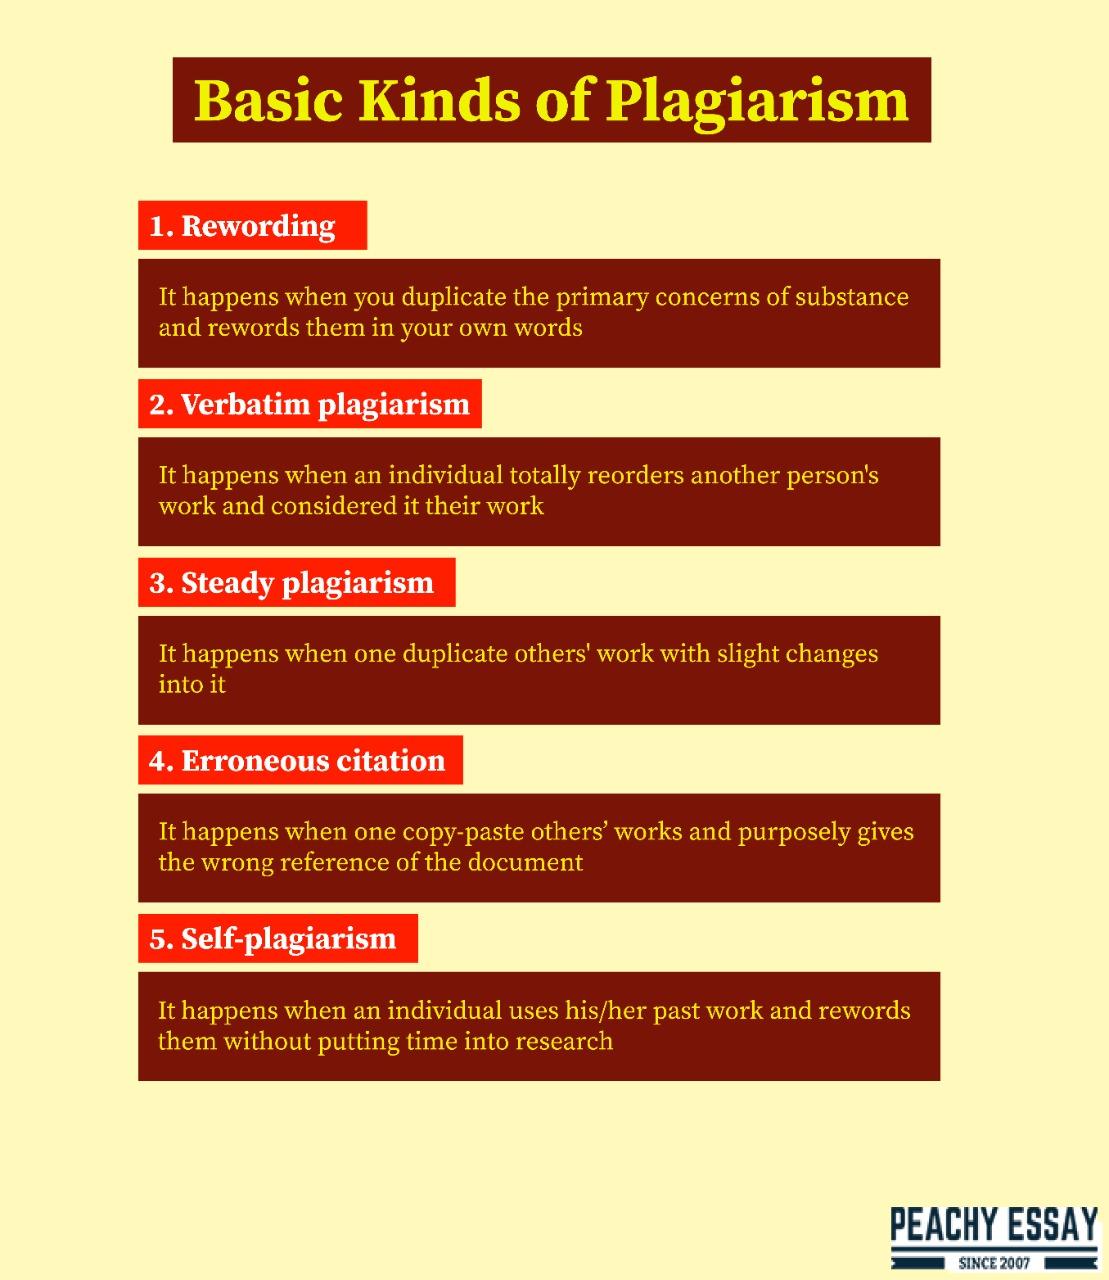 basic kinds of plagiarism